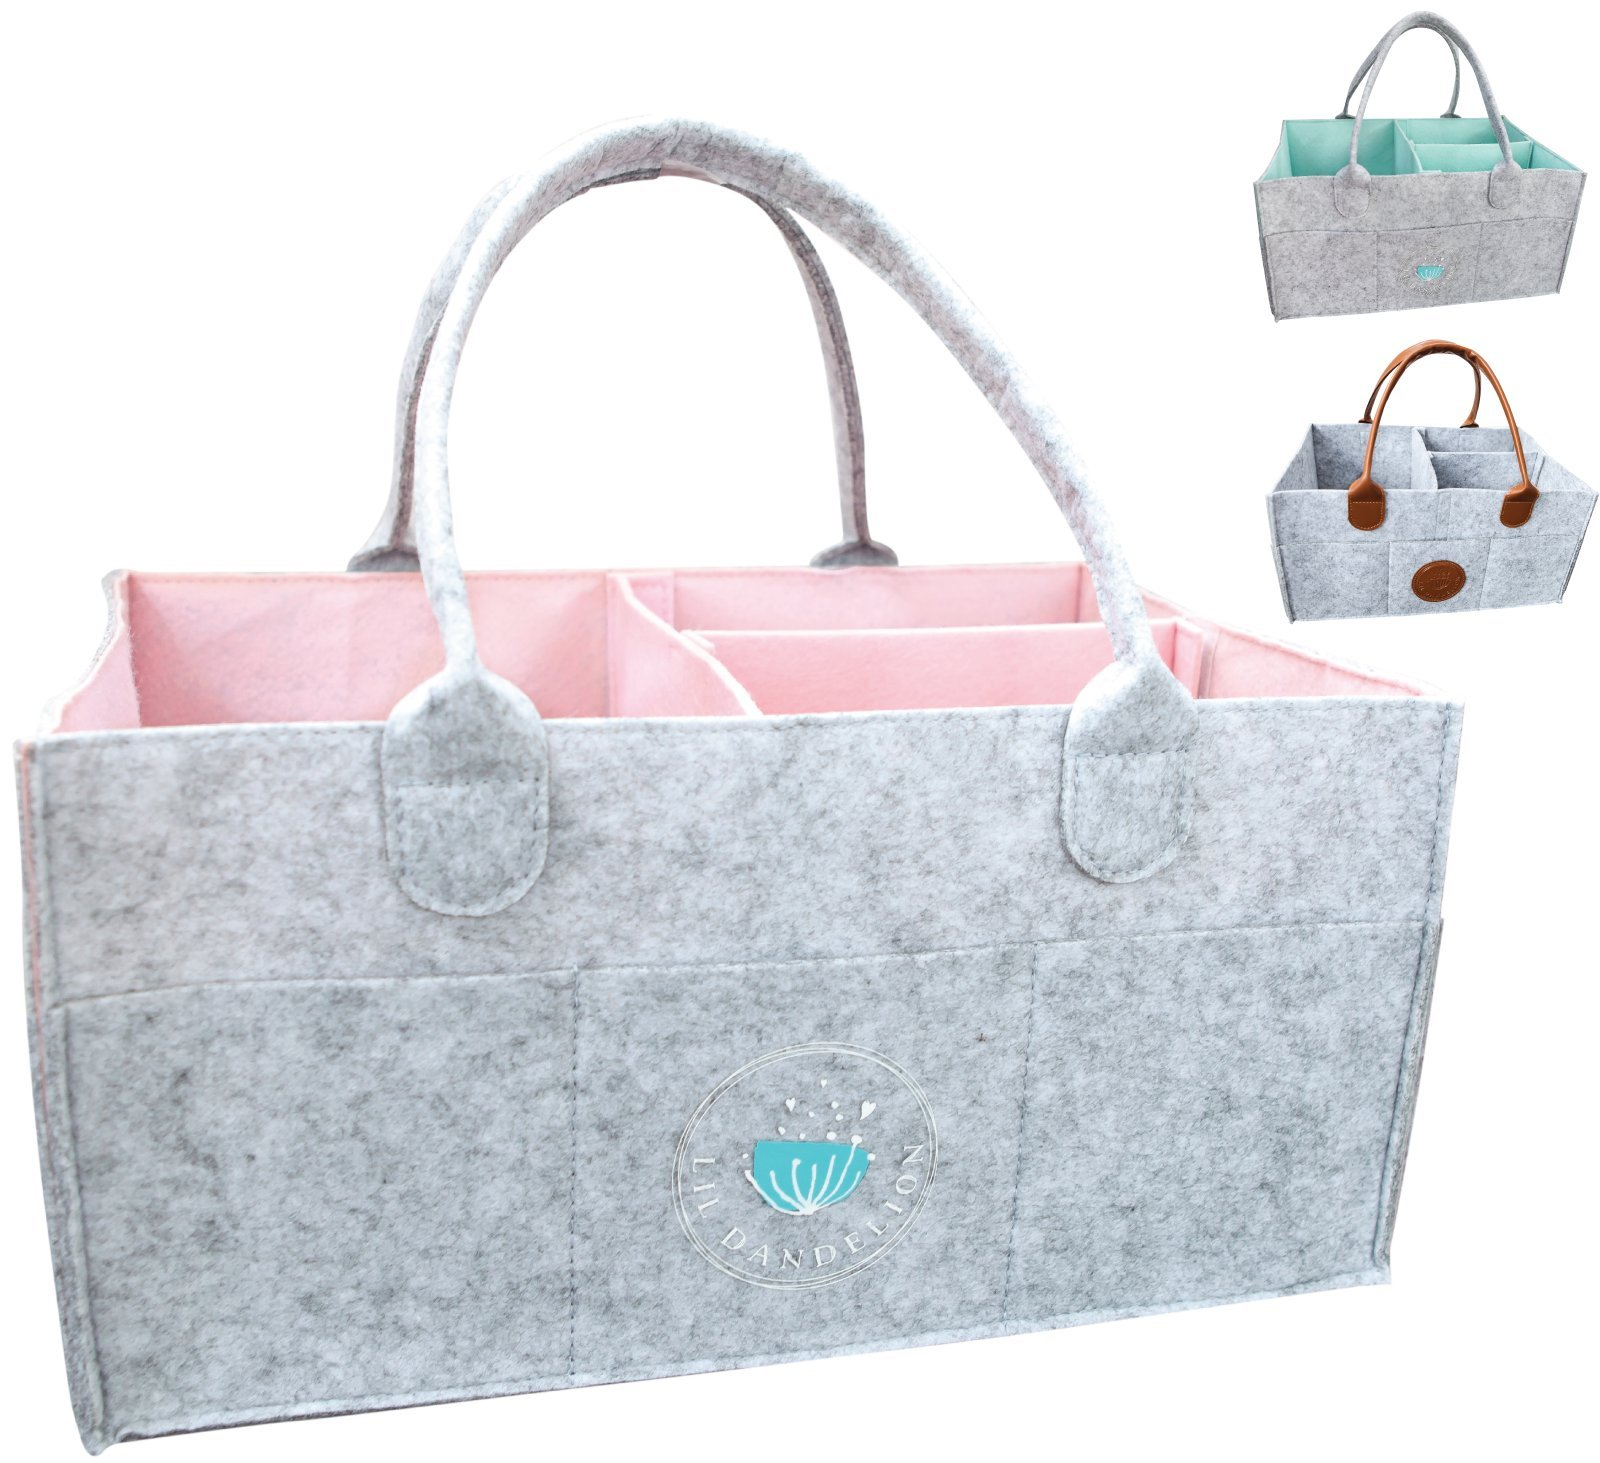 Baby Diaper Caddy Organizer - Baby Shower Gift Basket for Boy Girl ...